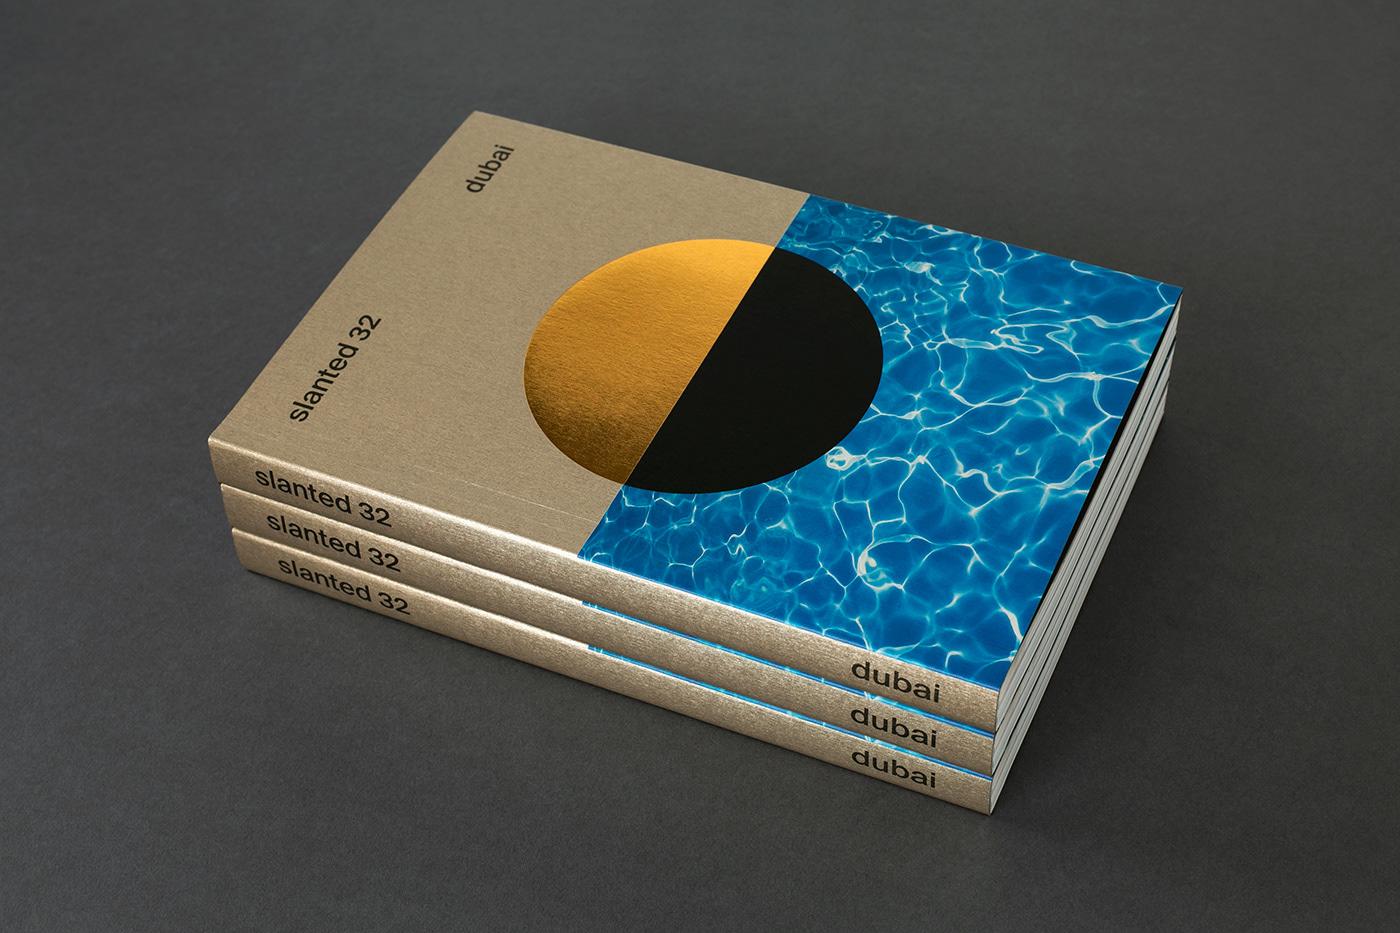 slanted slanted magazine Video interview designer artist United Arabic emirates dubai interview Design-Scene